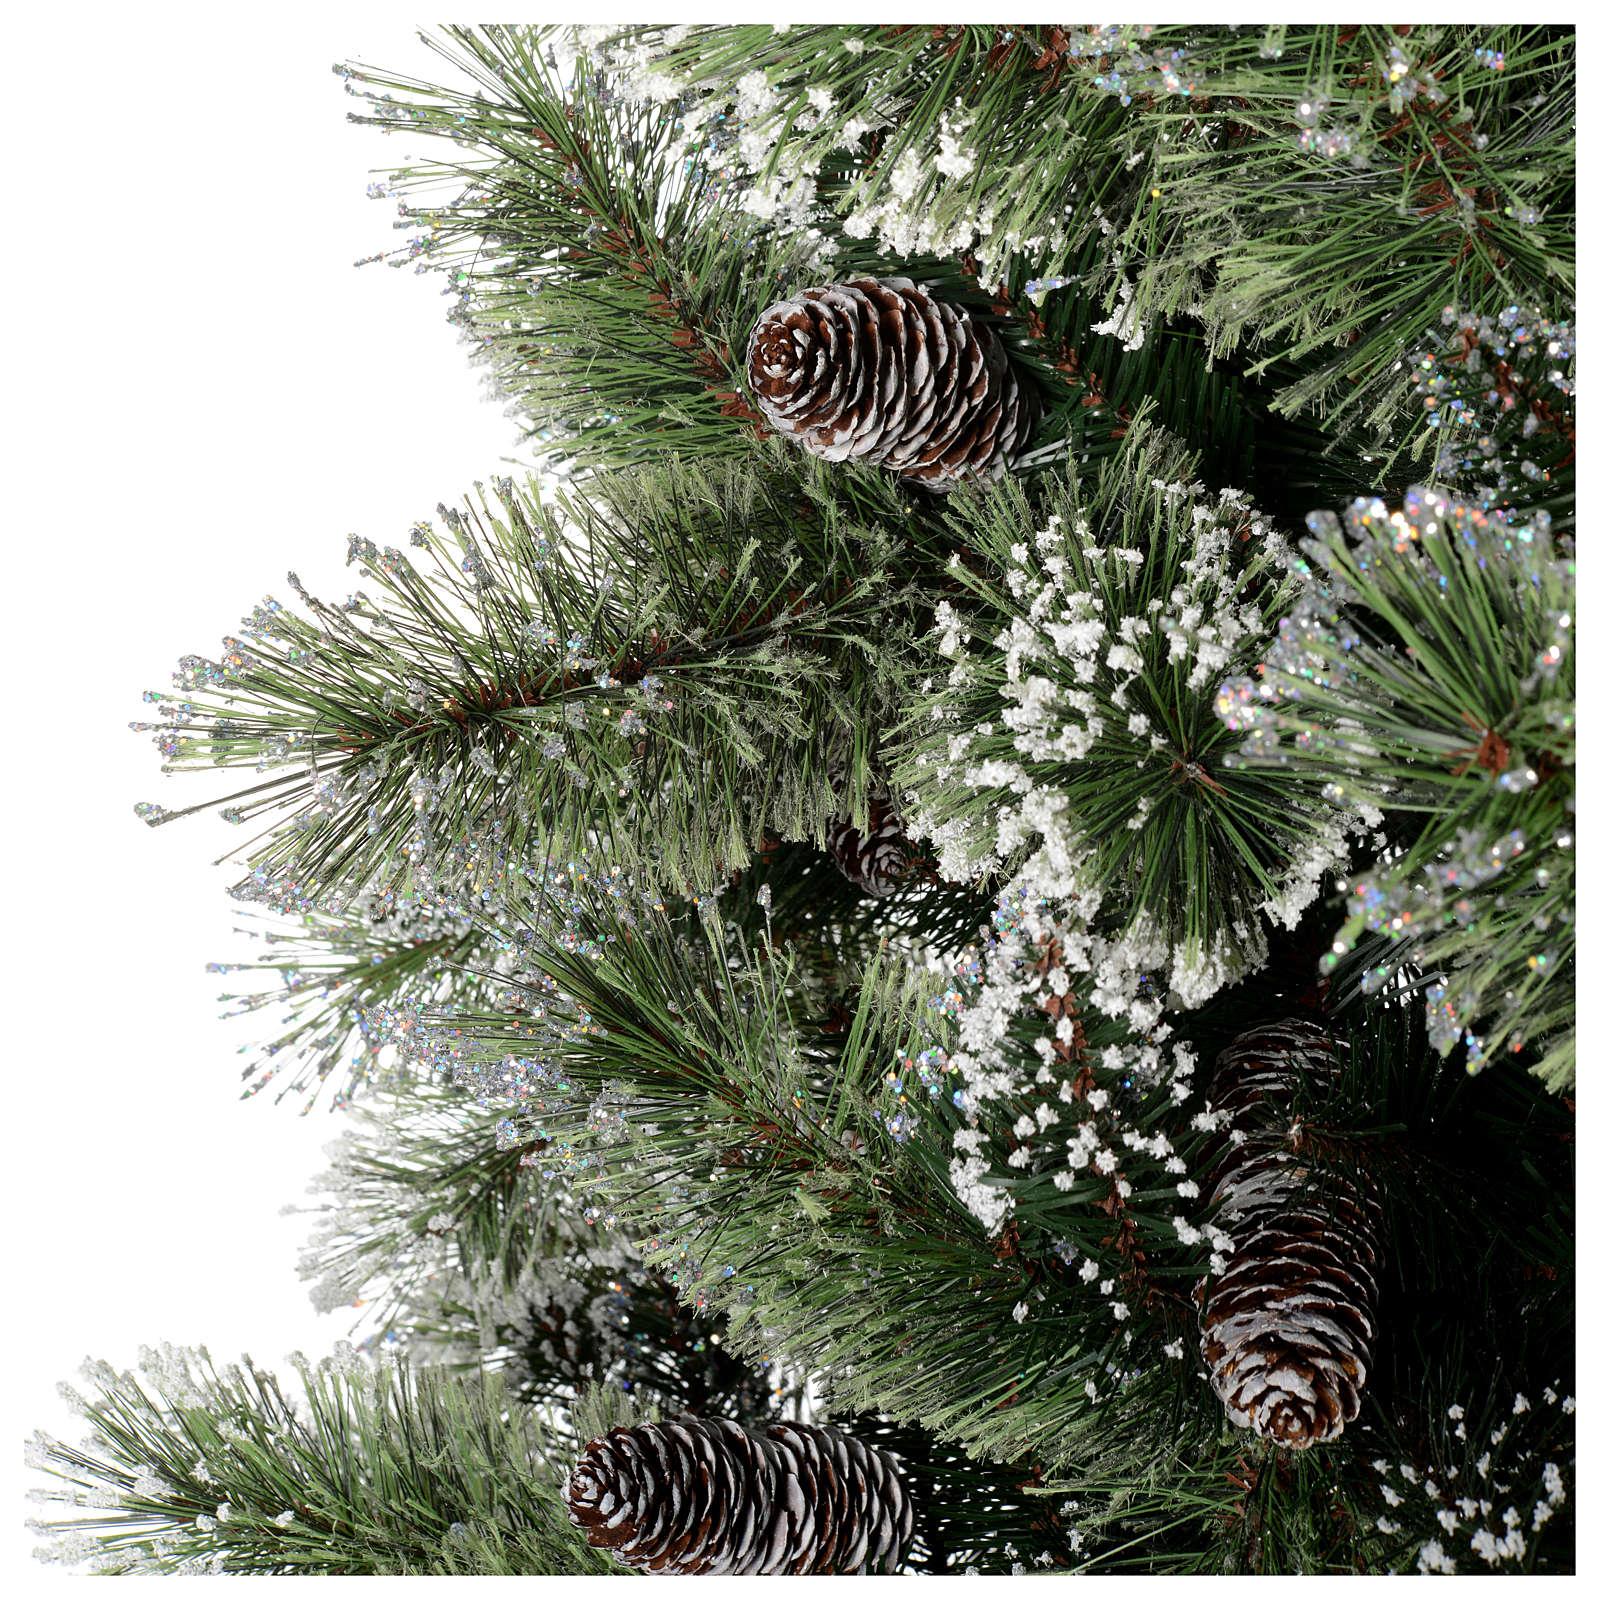 Albero Di Natale Slim 210.Albero Di Natale Slim 210 Leroy Merlin Disegni Di Natale